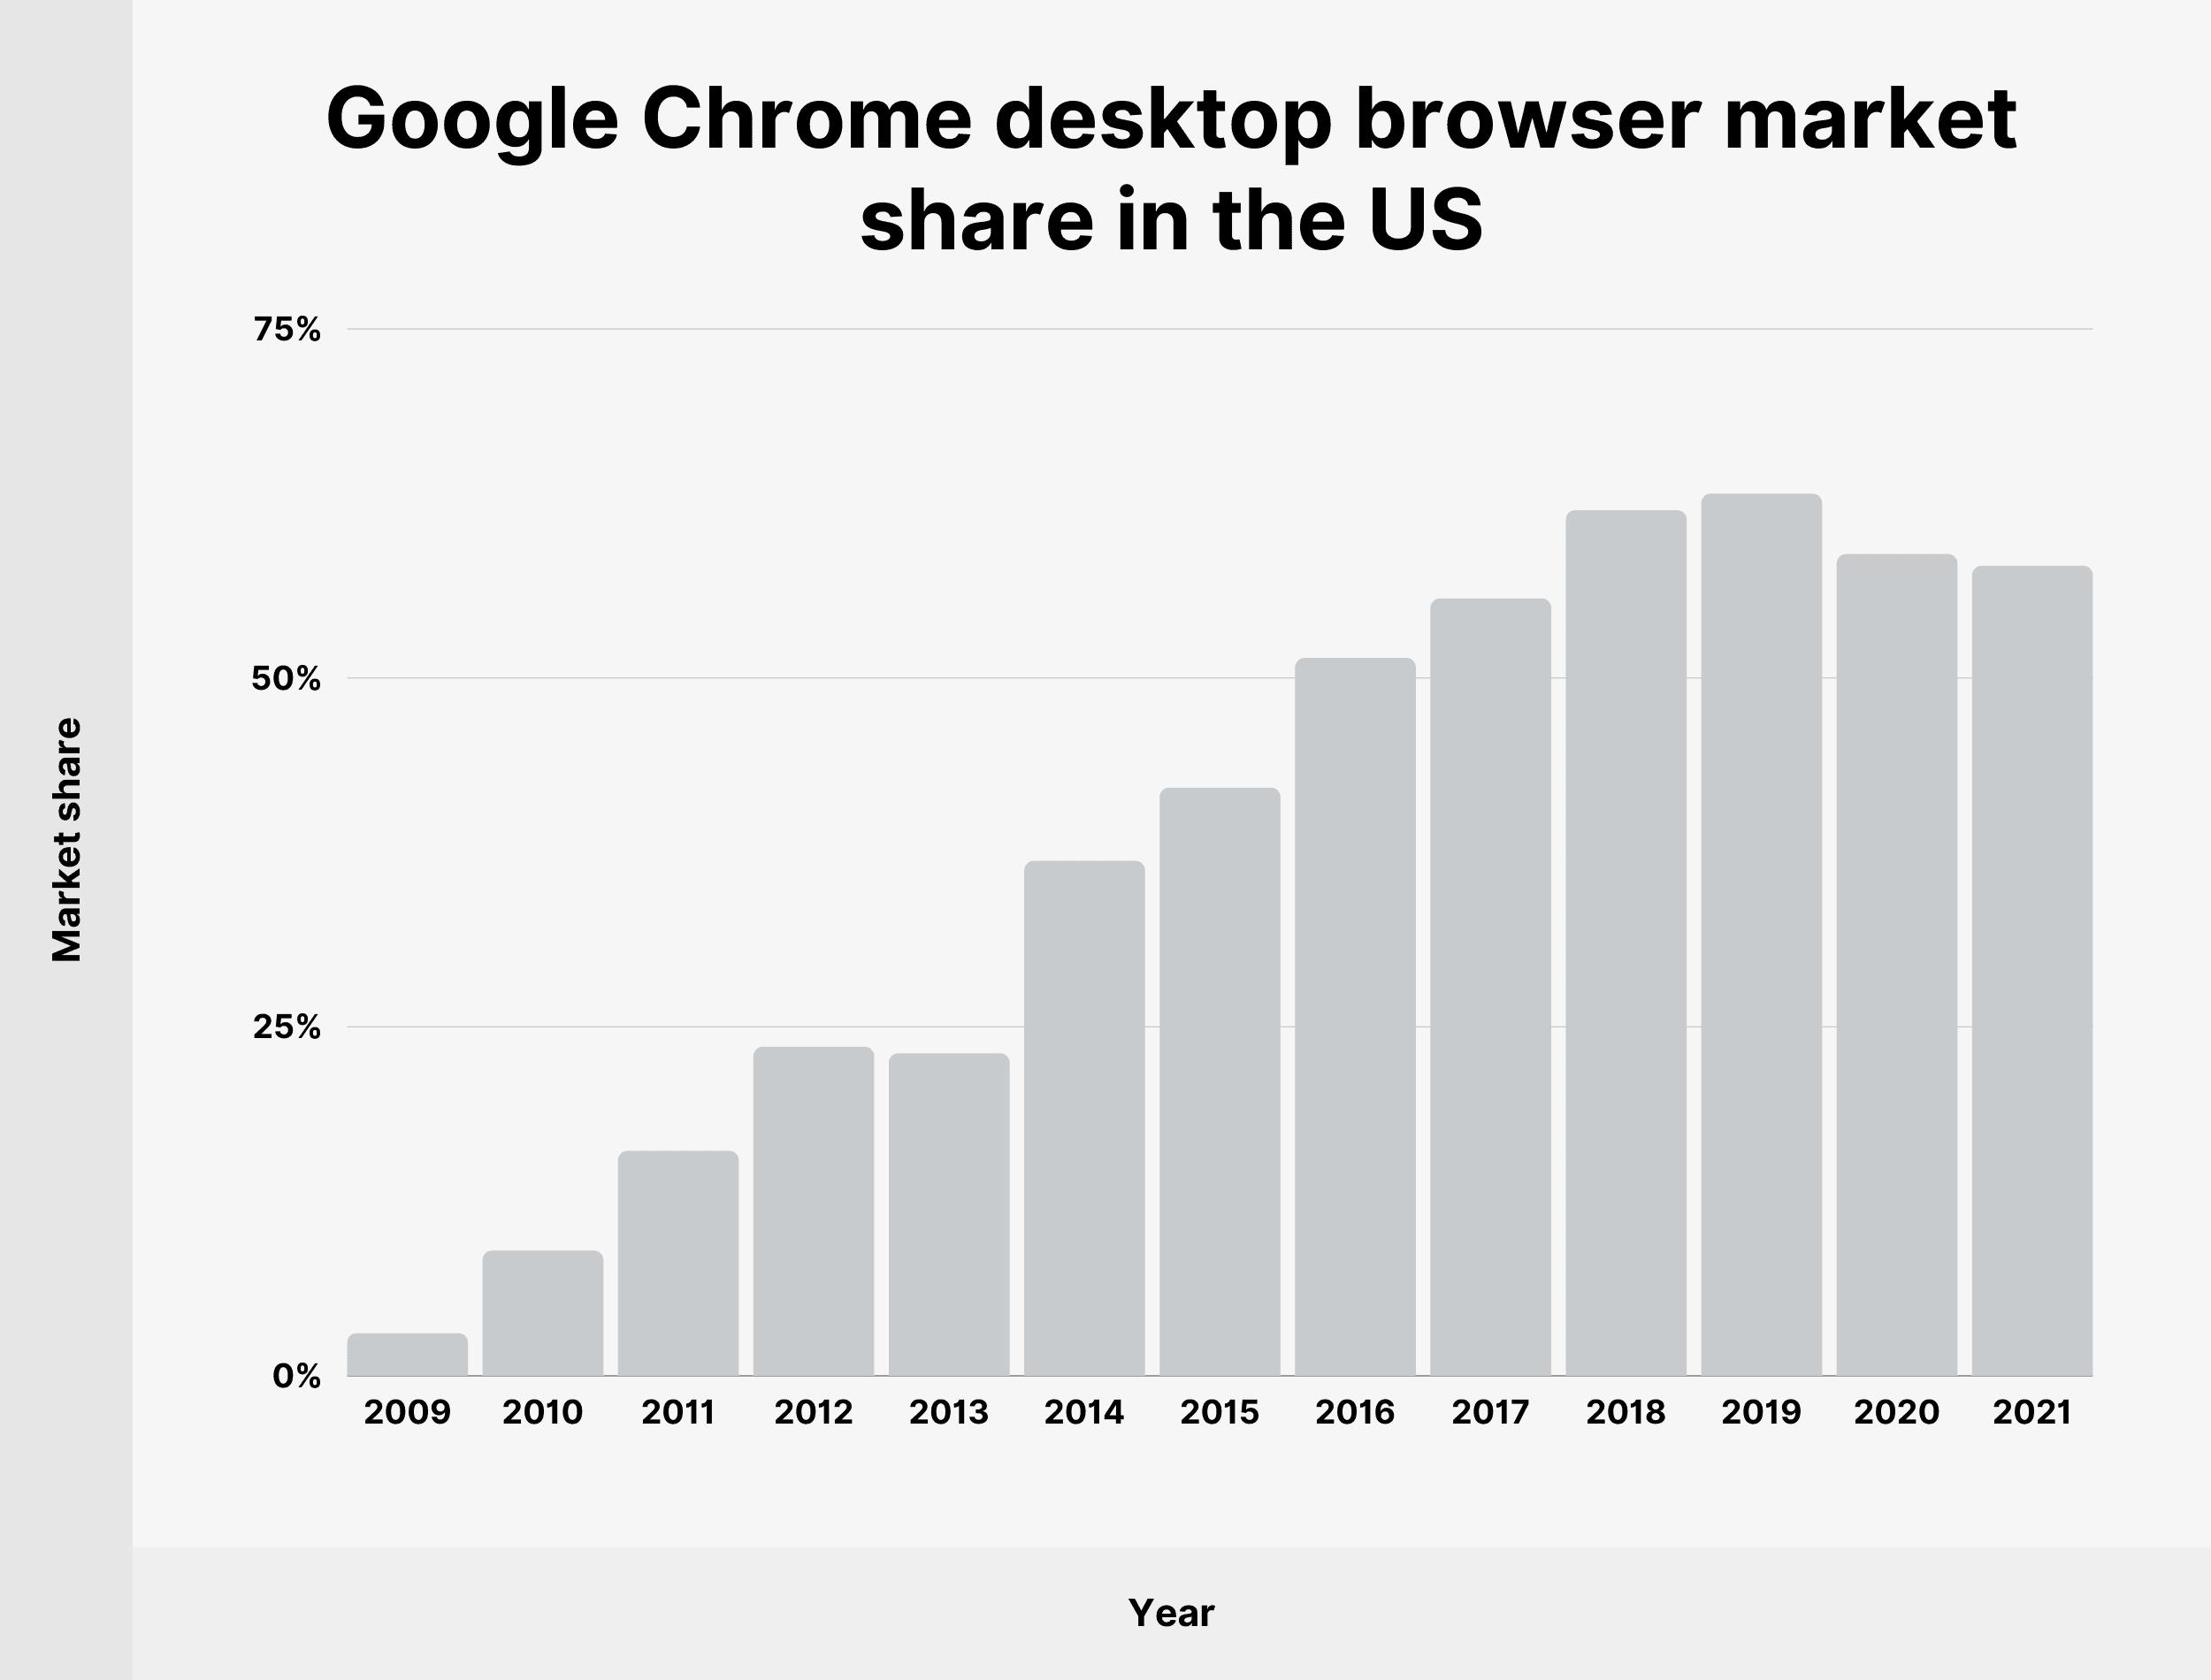 Google Chrome desktop browser market share in the US